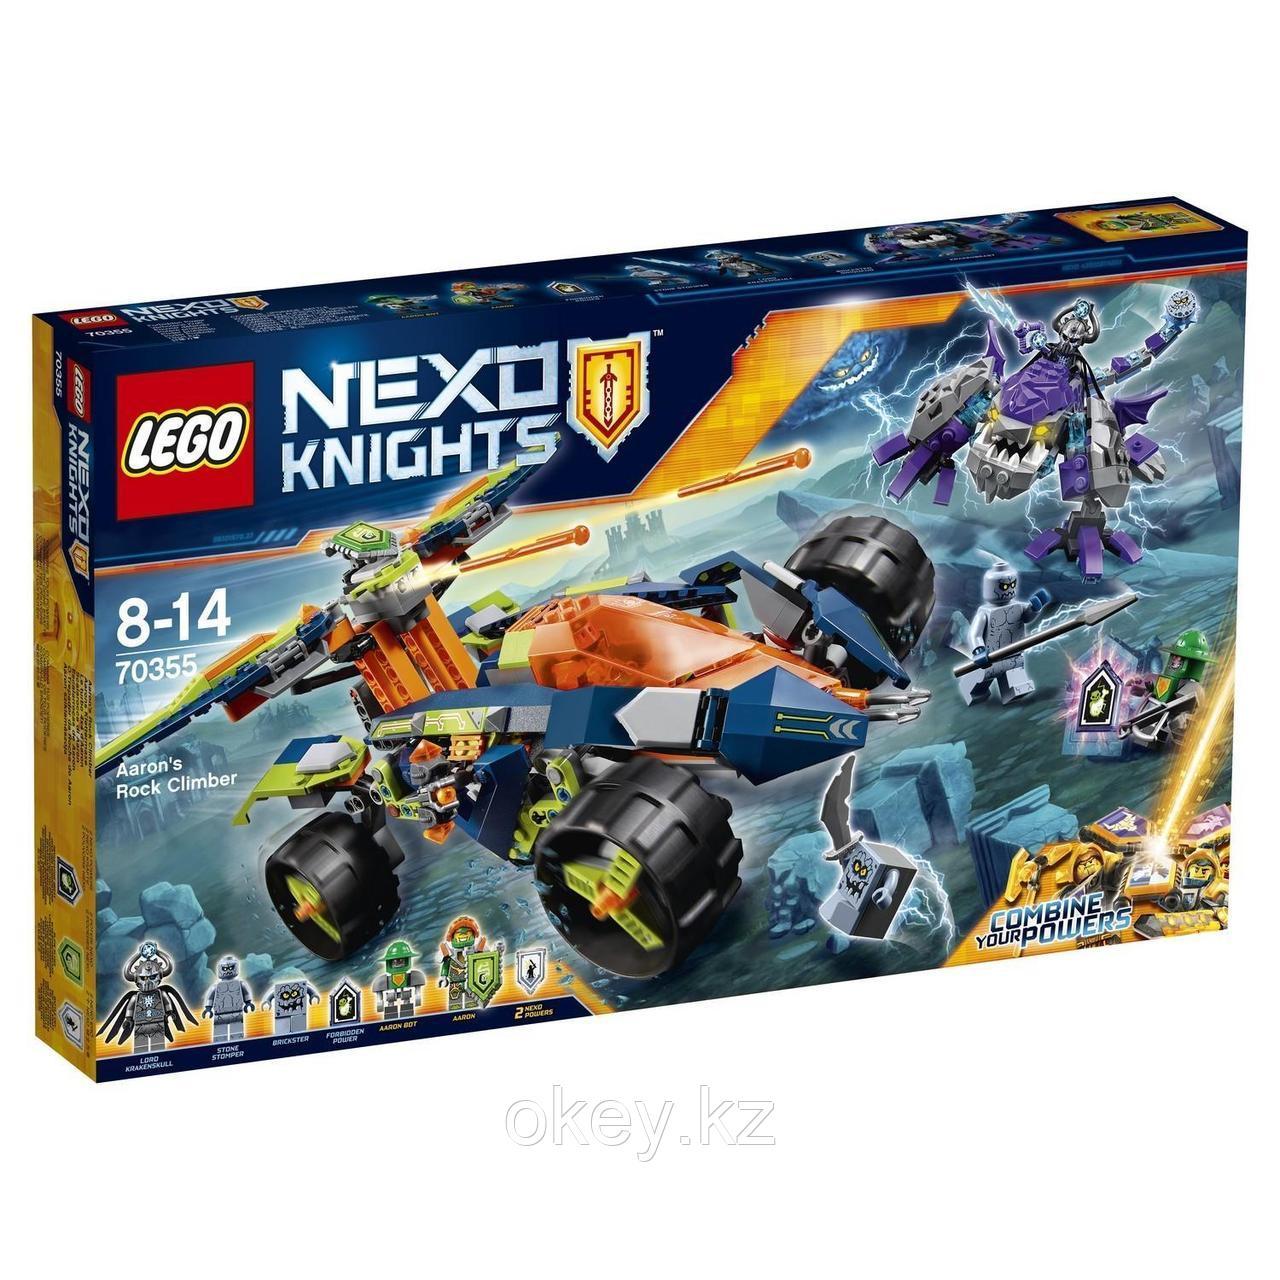 LEGO Nexo Knights: Вездеход Аарона 4x4 70355